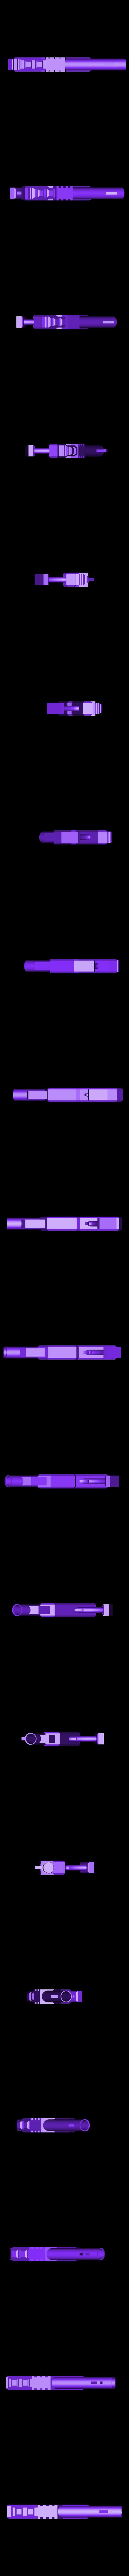 ArcadeMFGunBin.stl Download STL file Arcade Miss Fortune Gun • 3D printer model, Laramaine